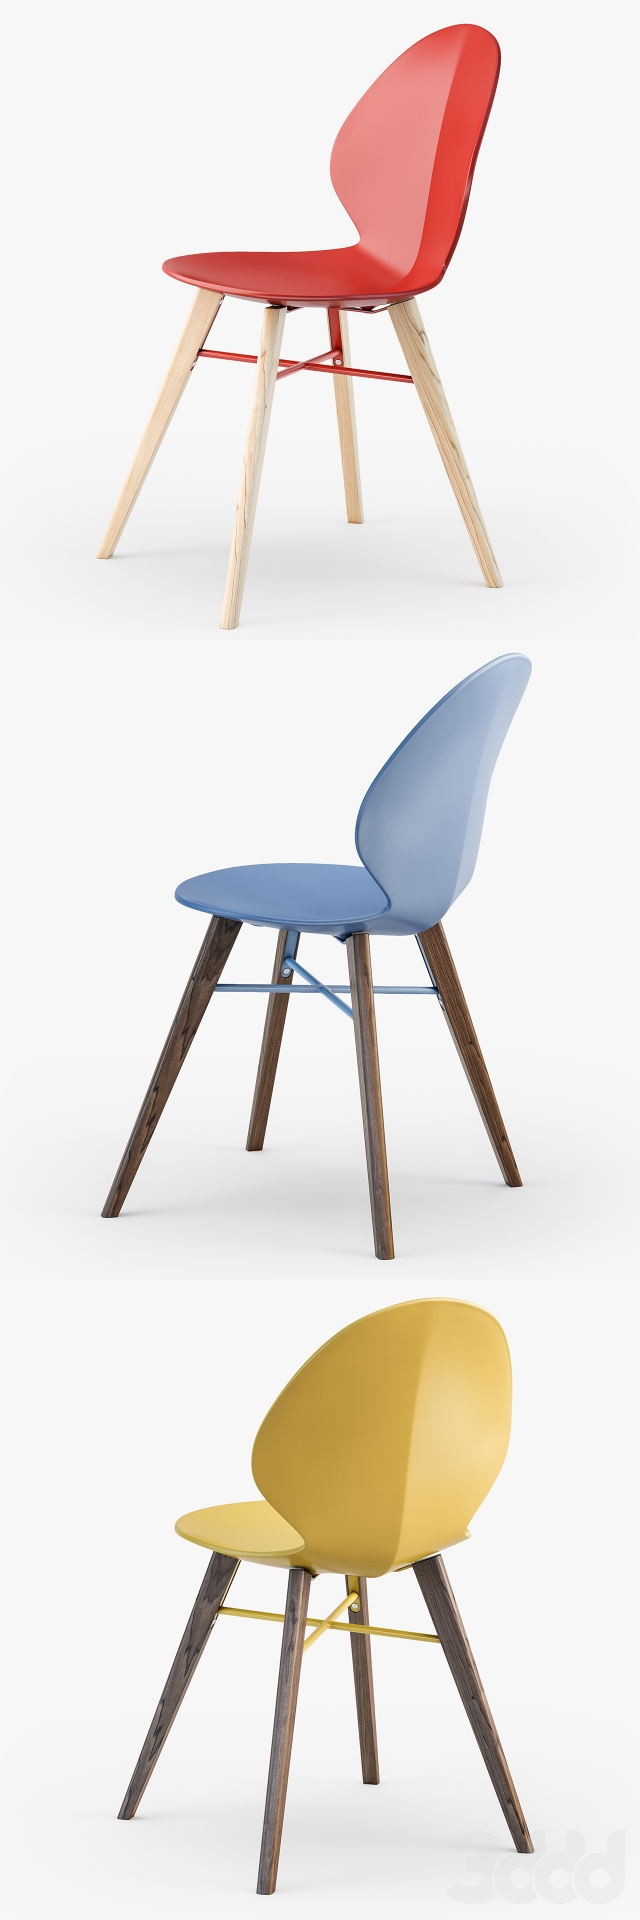 3d calligaris basil w chair for Calligaris basil w